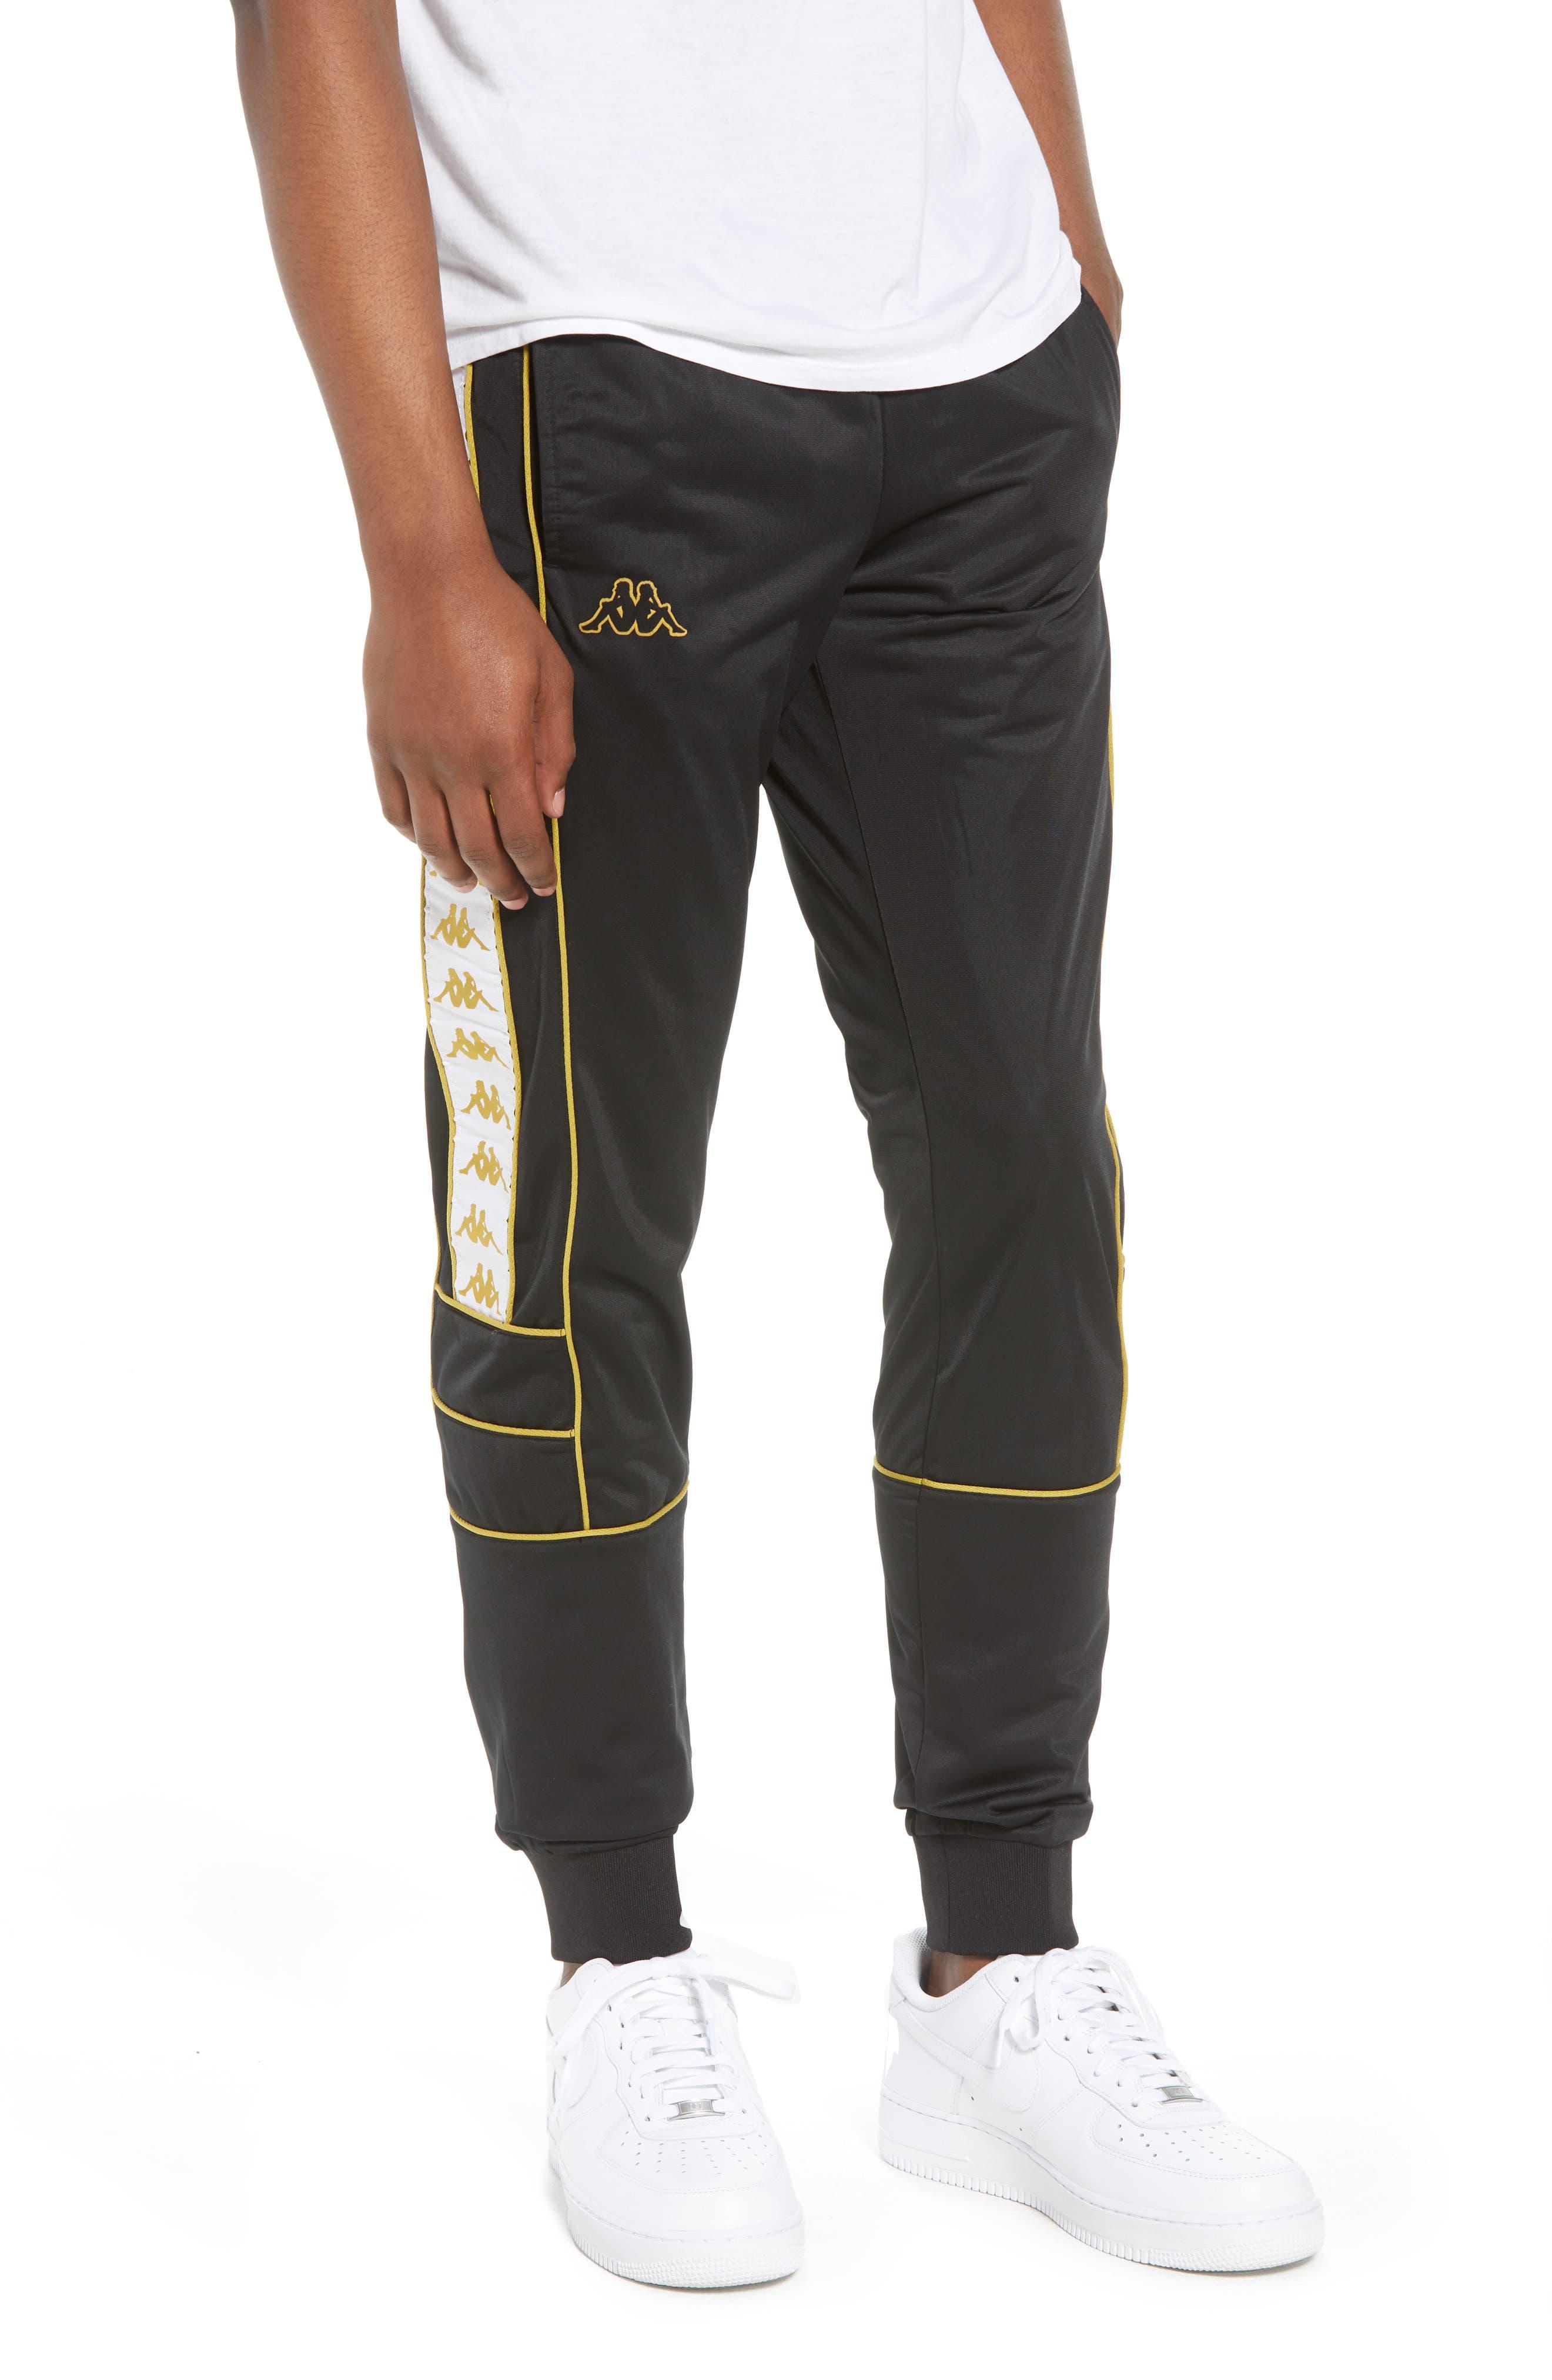 Racing Track Pants,                             Main thumbnail 1, color,                             Black/ White Gold